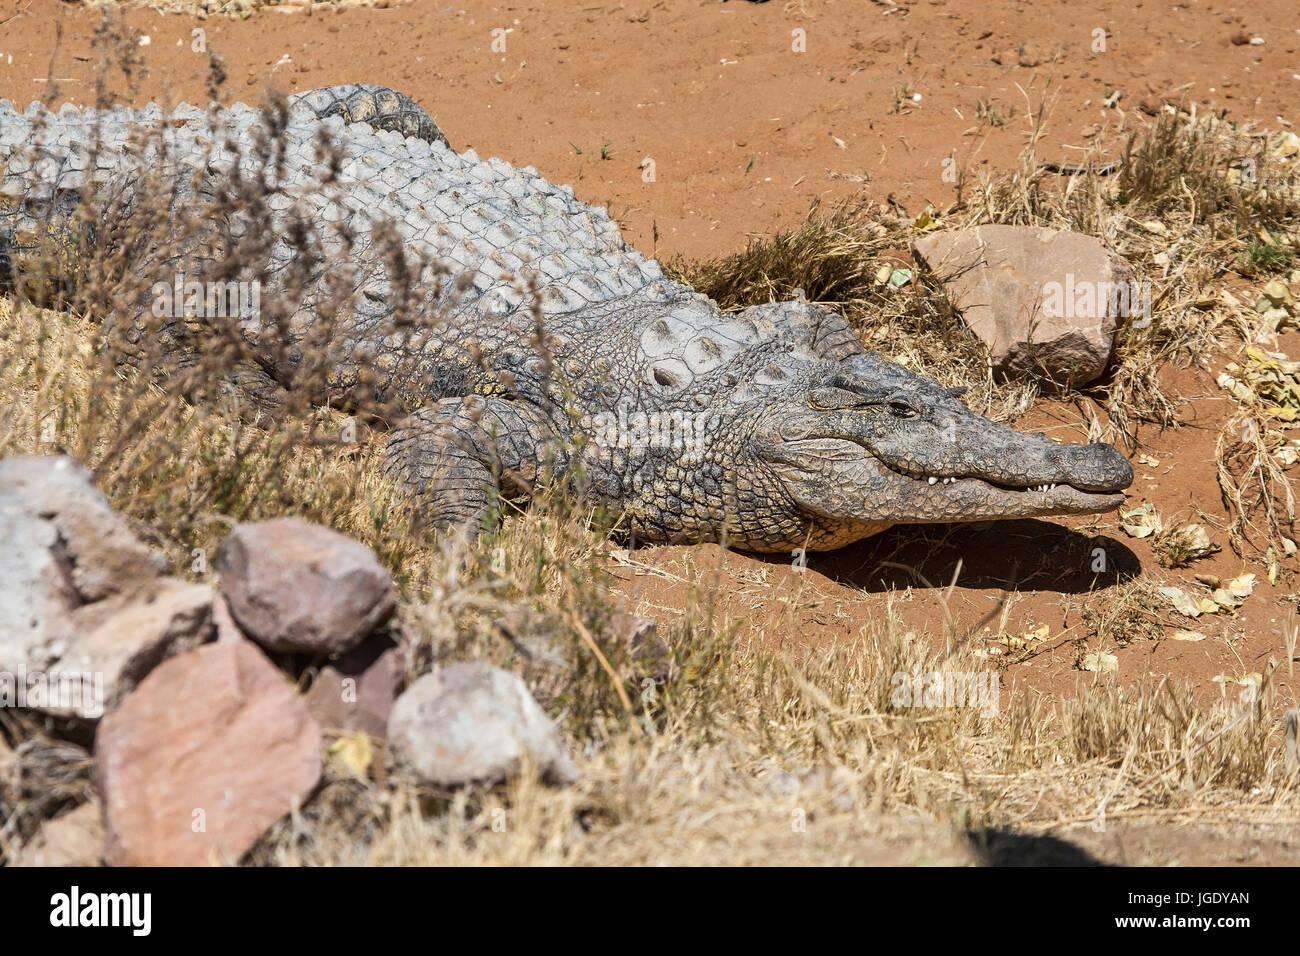 Strip crocodile, Crocodylus porosus, Leistenkrokodil (Crocodylus porosus) - Stock Image